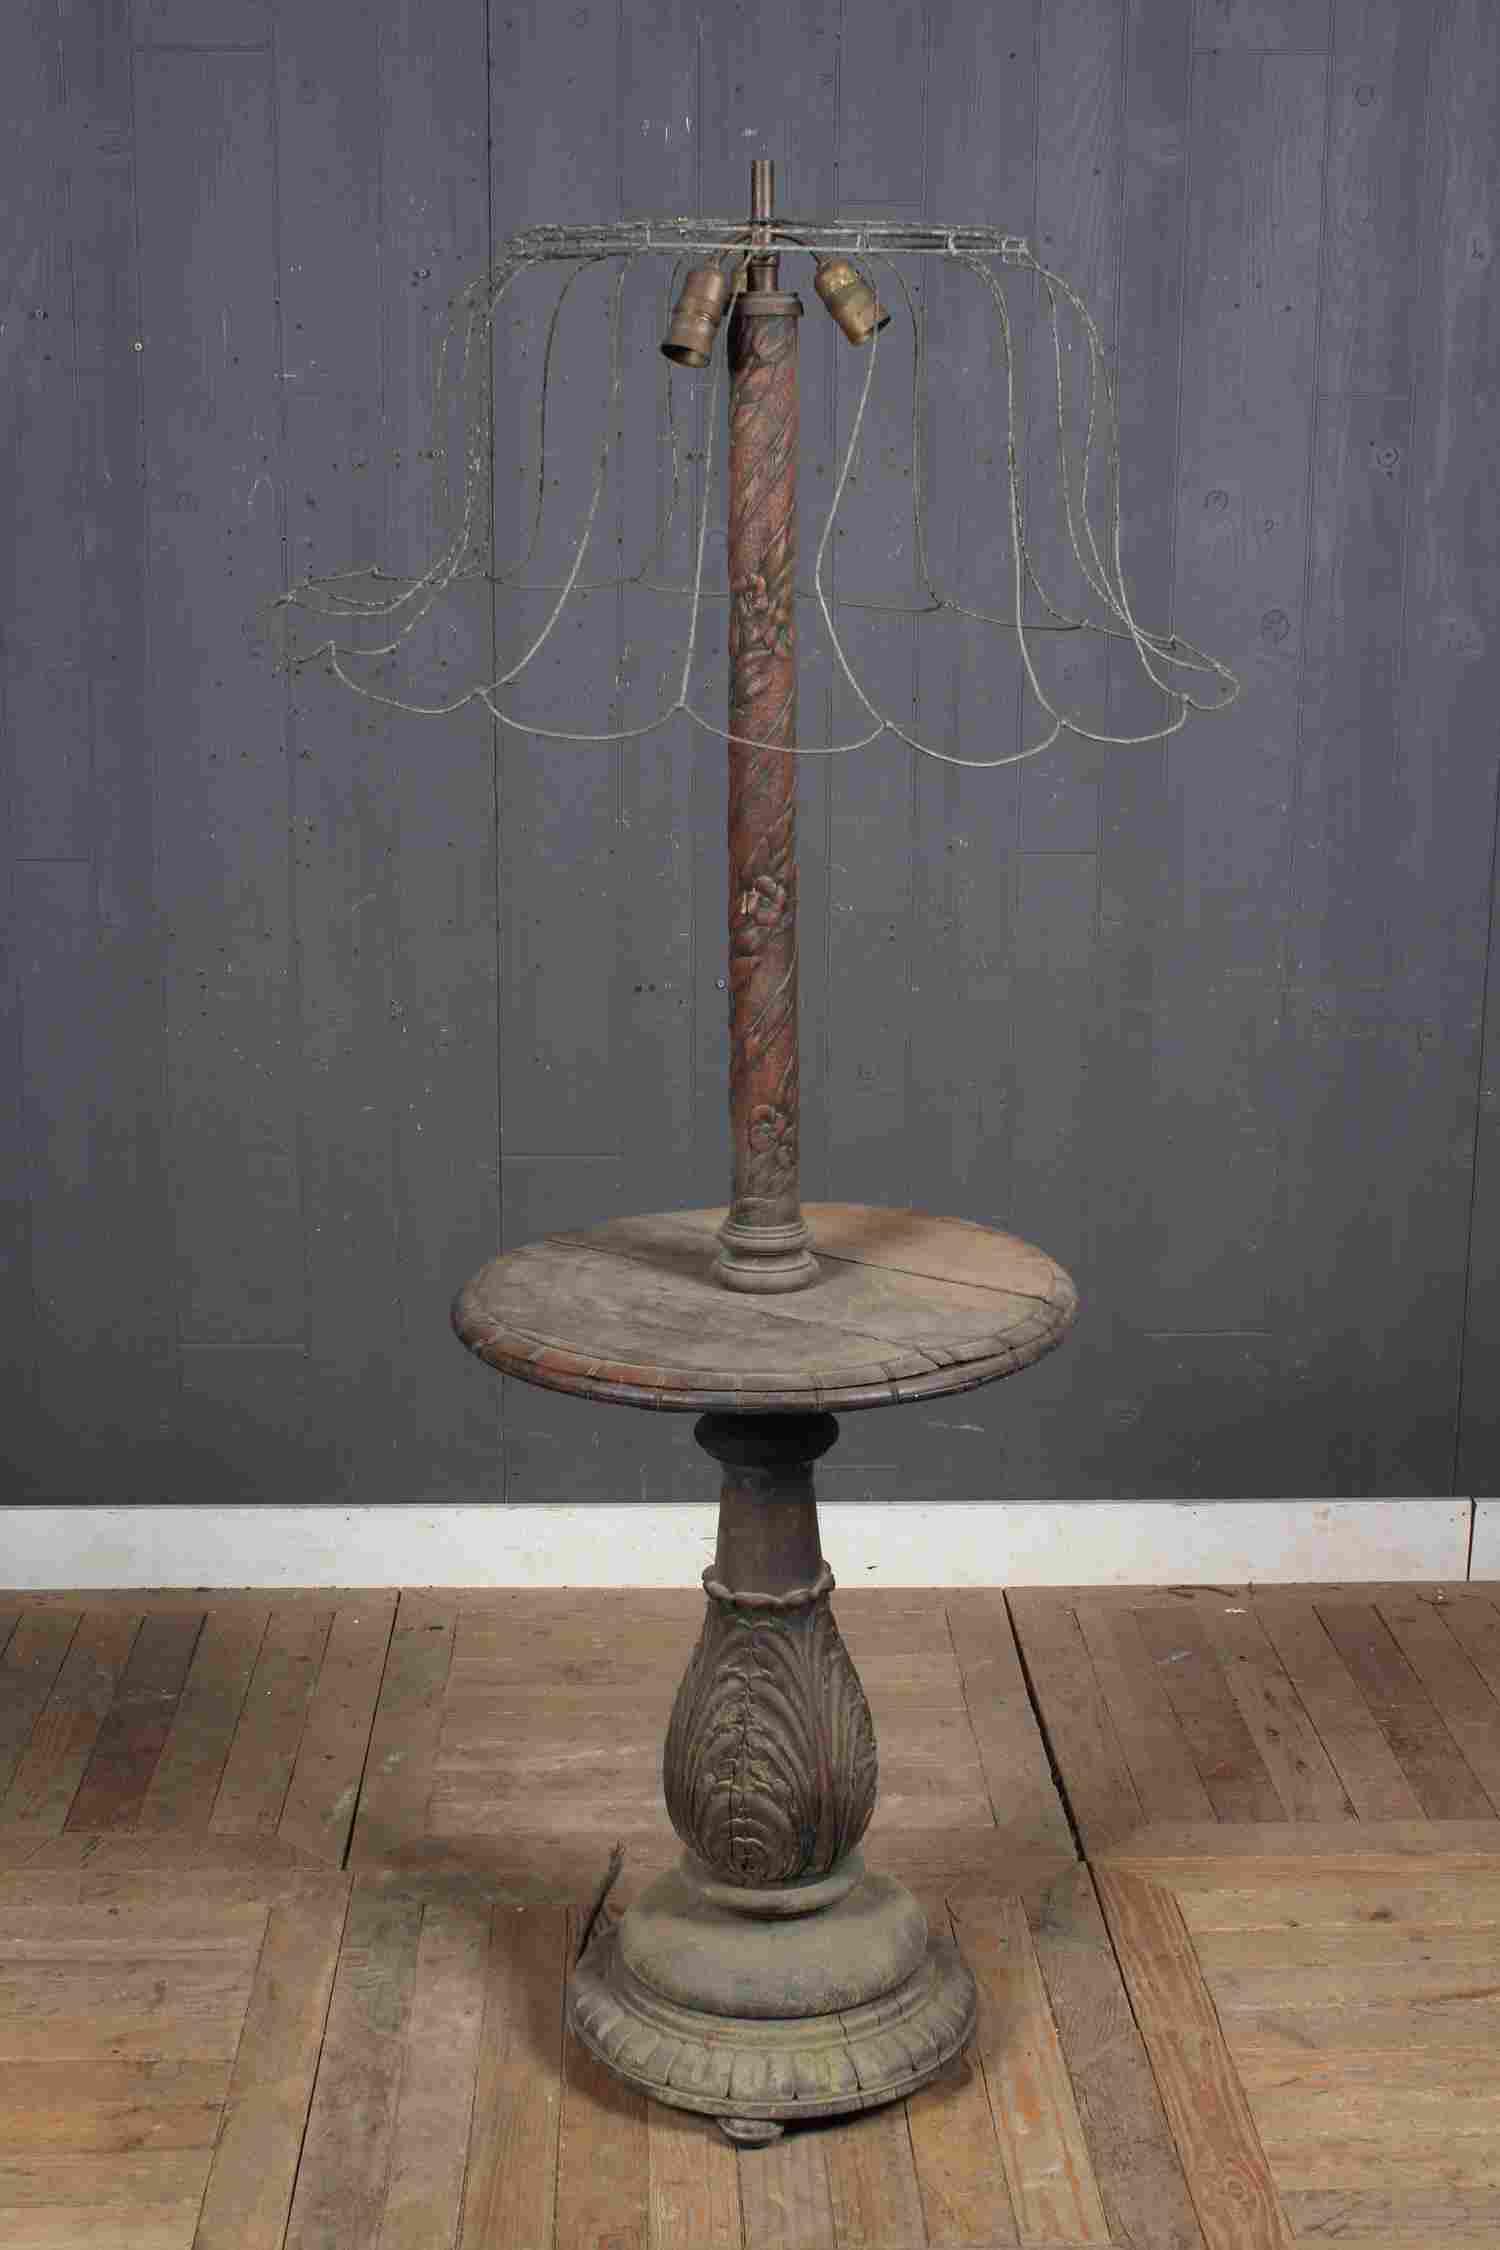 Antique Balustrade Form Floor Lamp